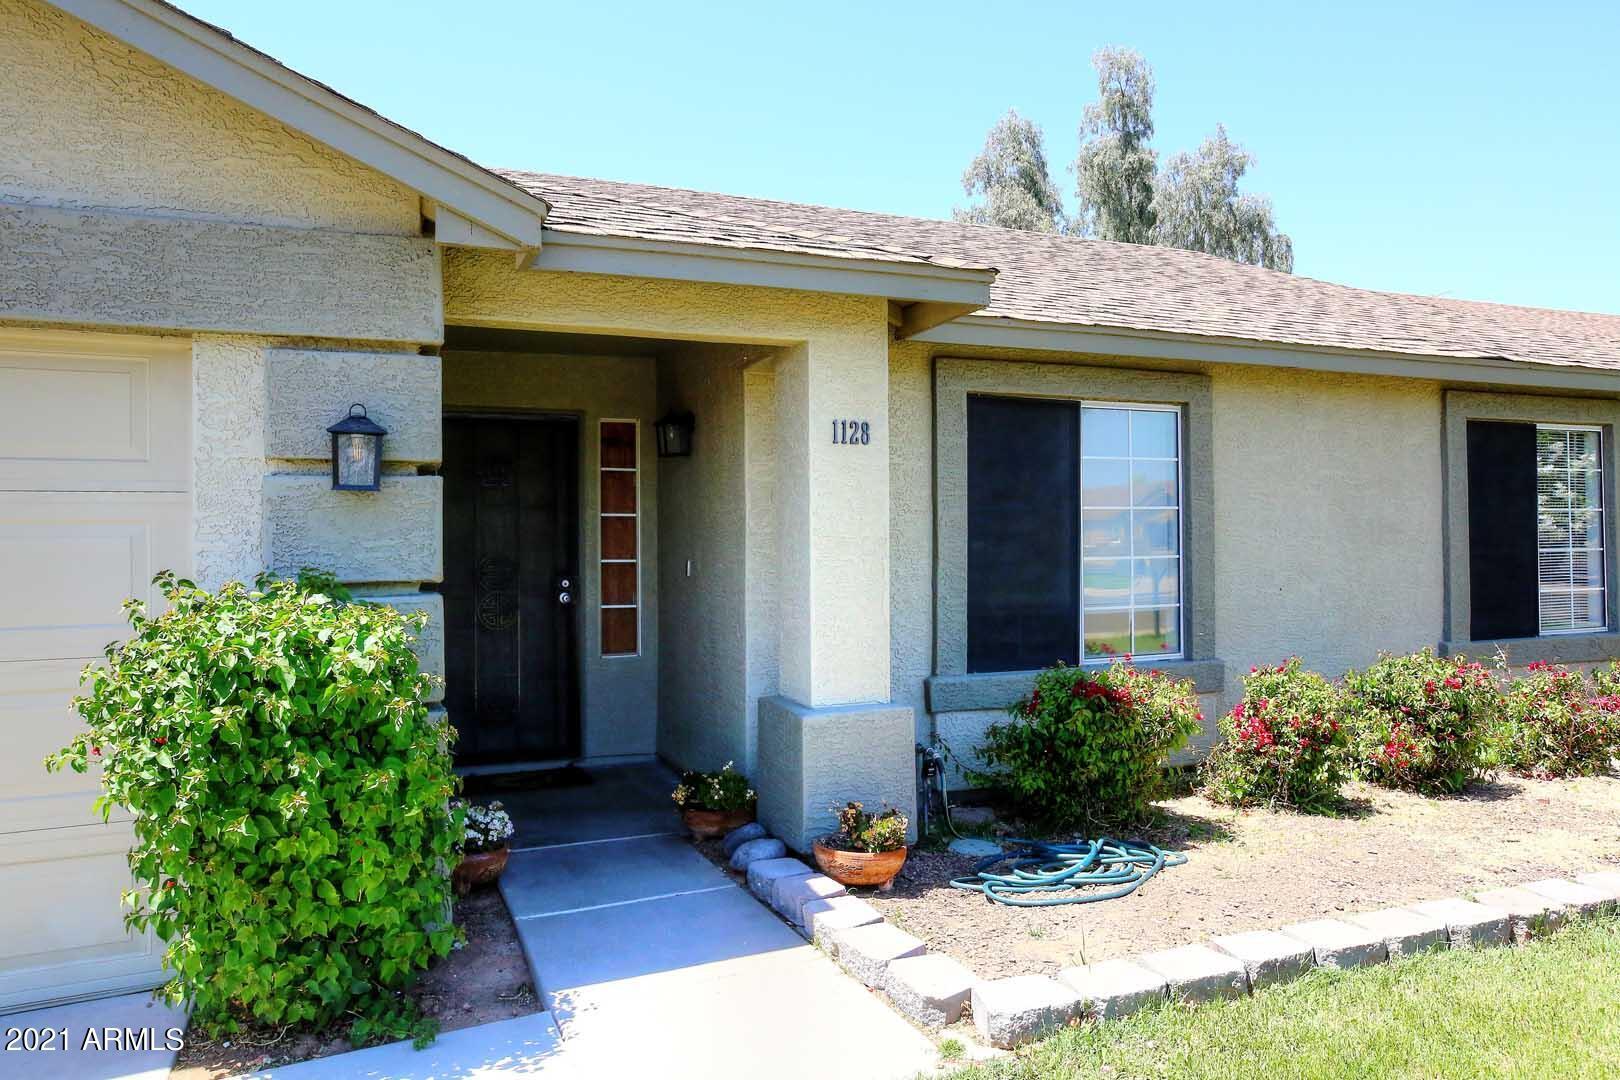 1128 WANDA Drive, Gilbert, Arizona 85296, 3 Bedrooms Bedrooms, ,2 BathroomsBathrooms,Residential,For Sale,WANDA,6223988